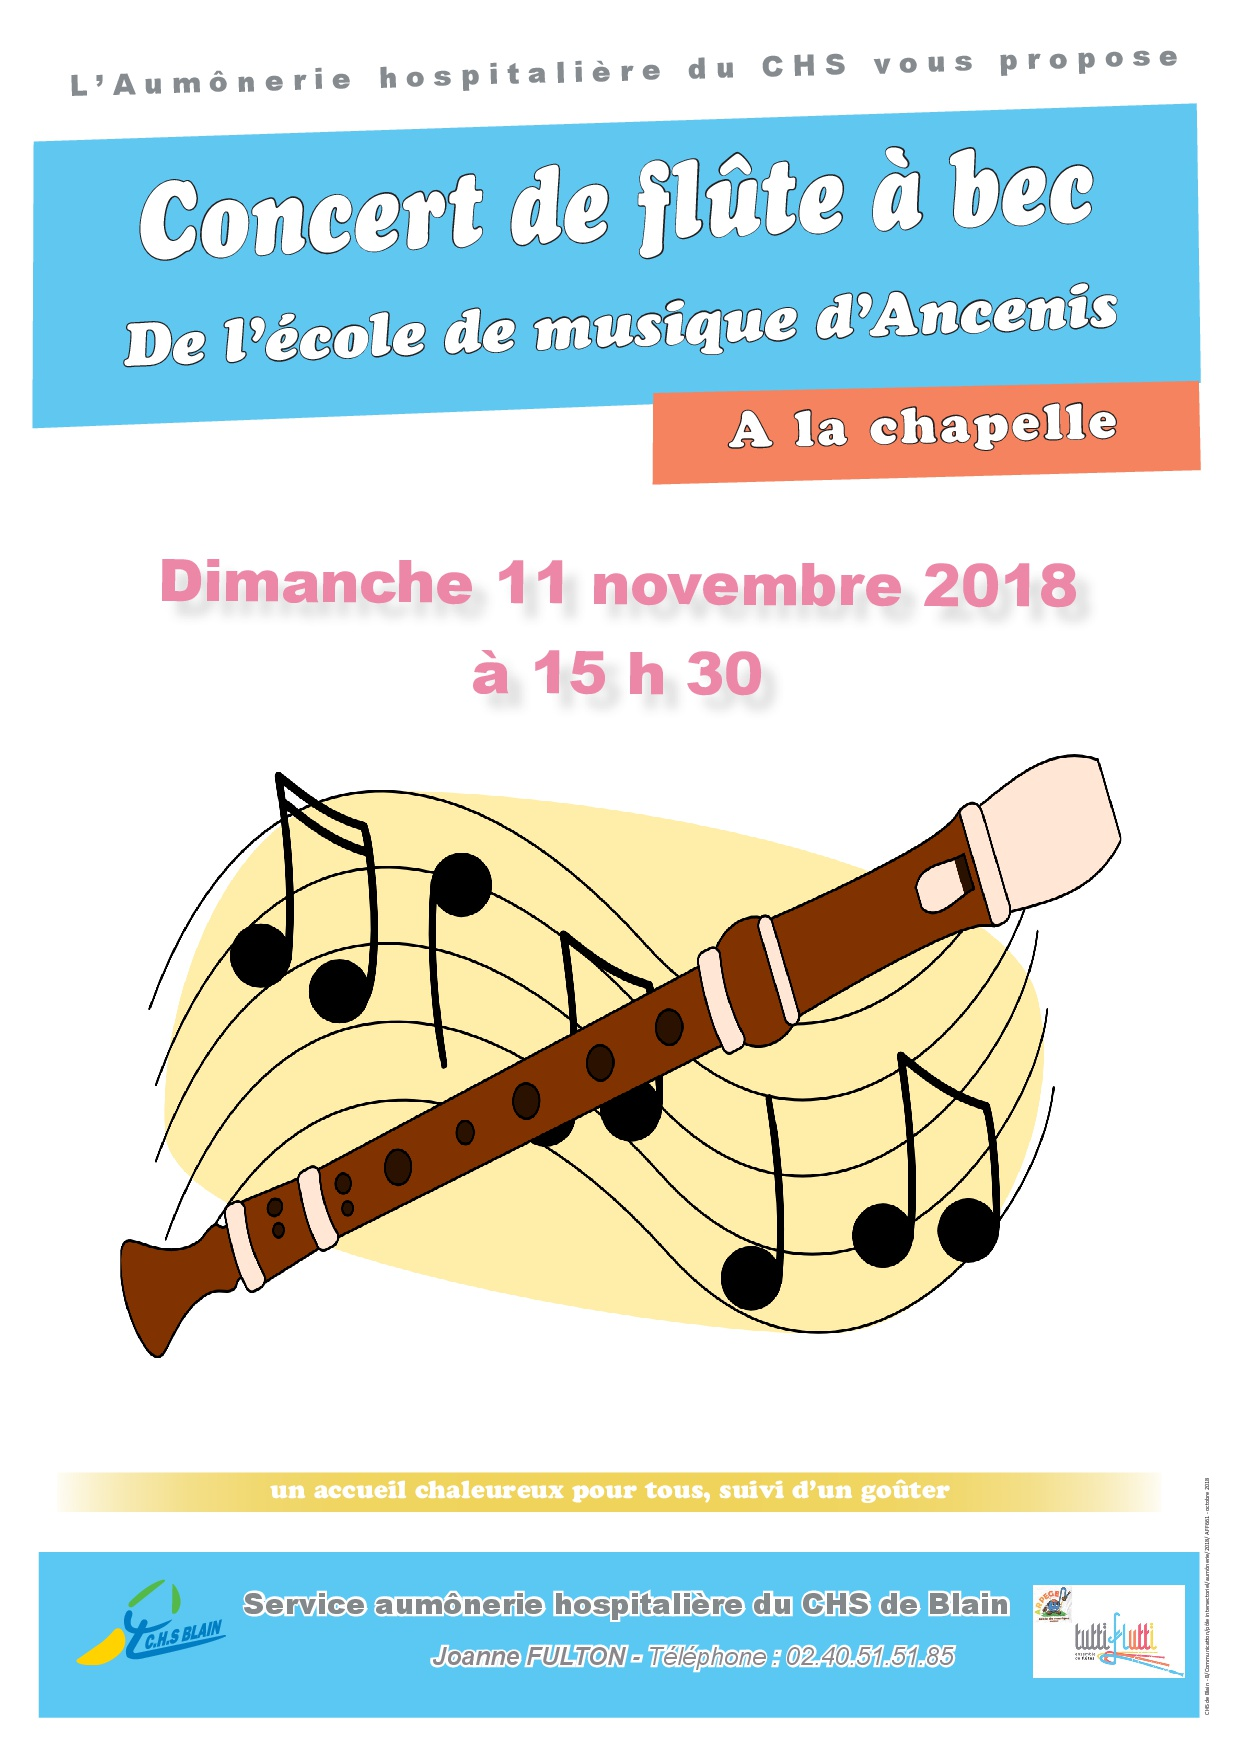 Aff661 concert flute a bec